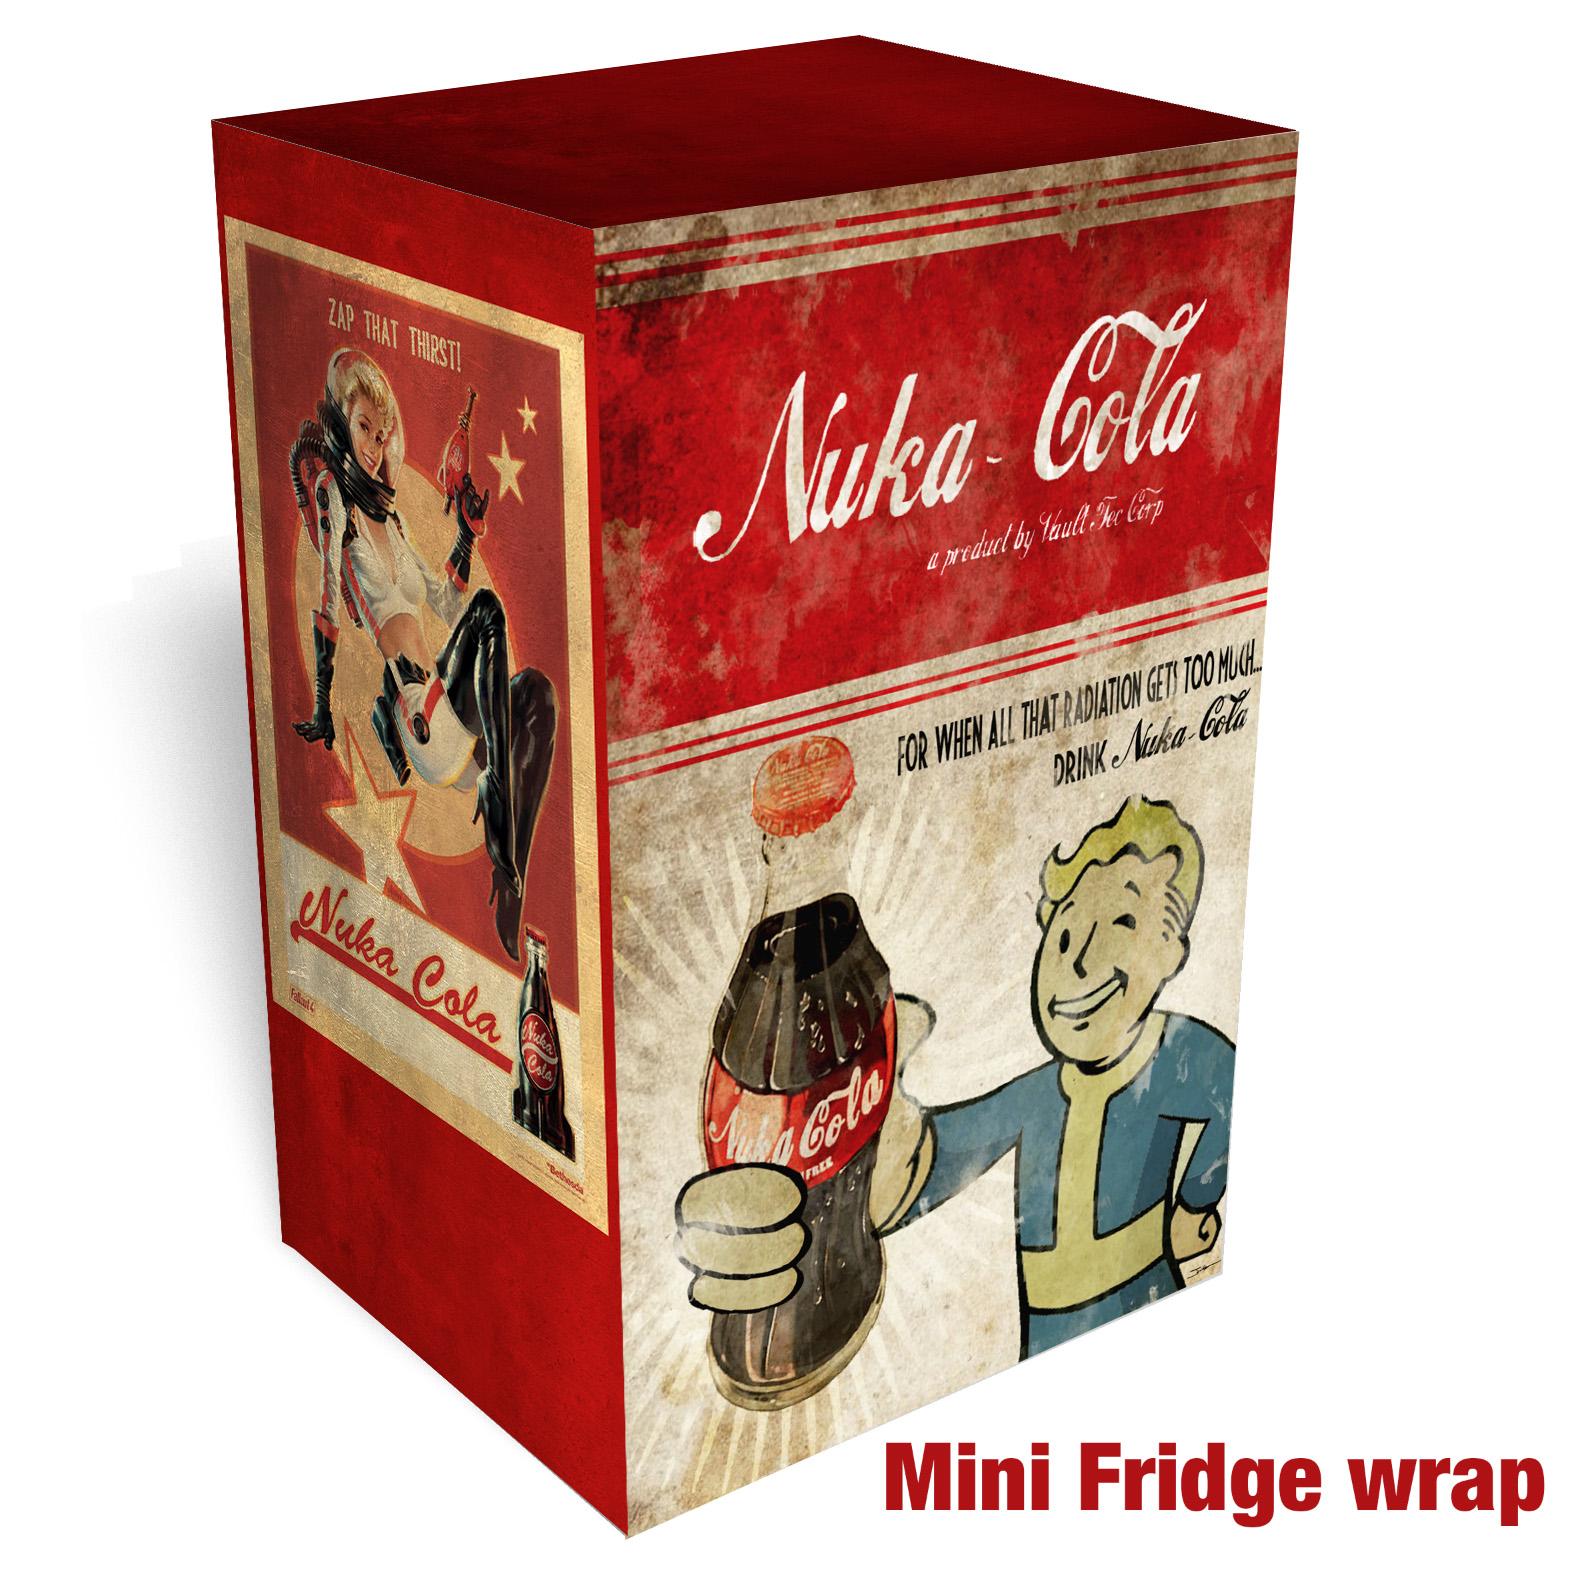 NUKA COLA Mini fridge wrap Full.